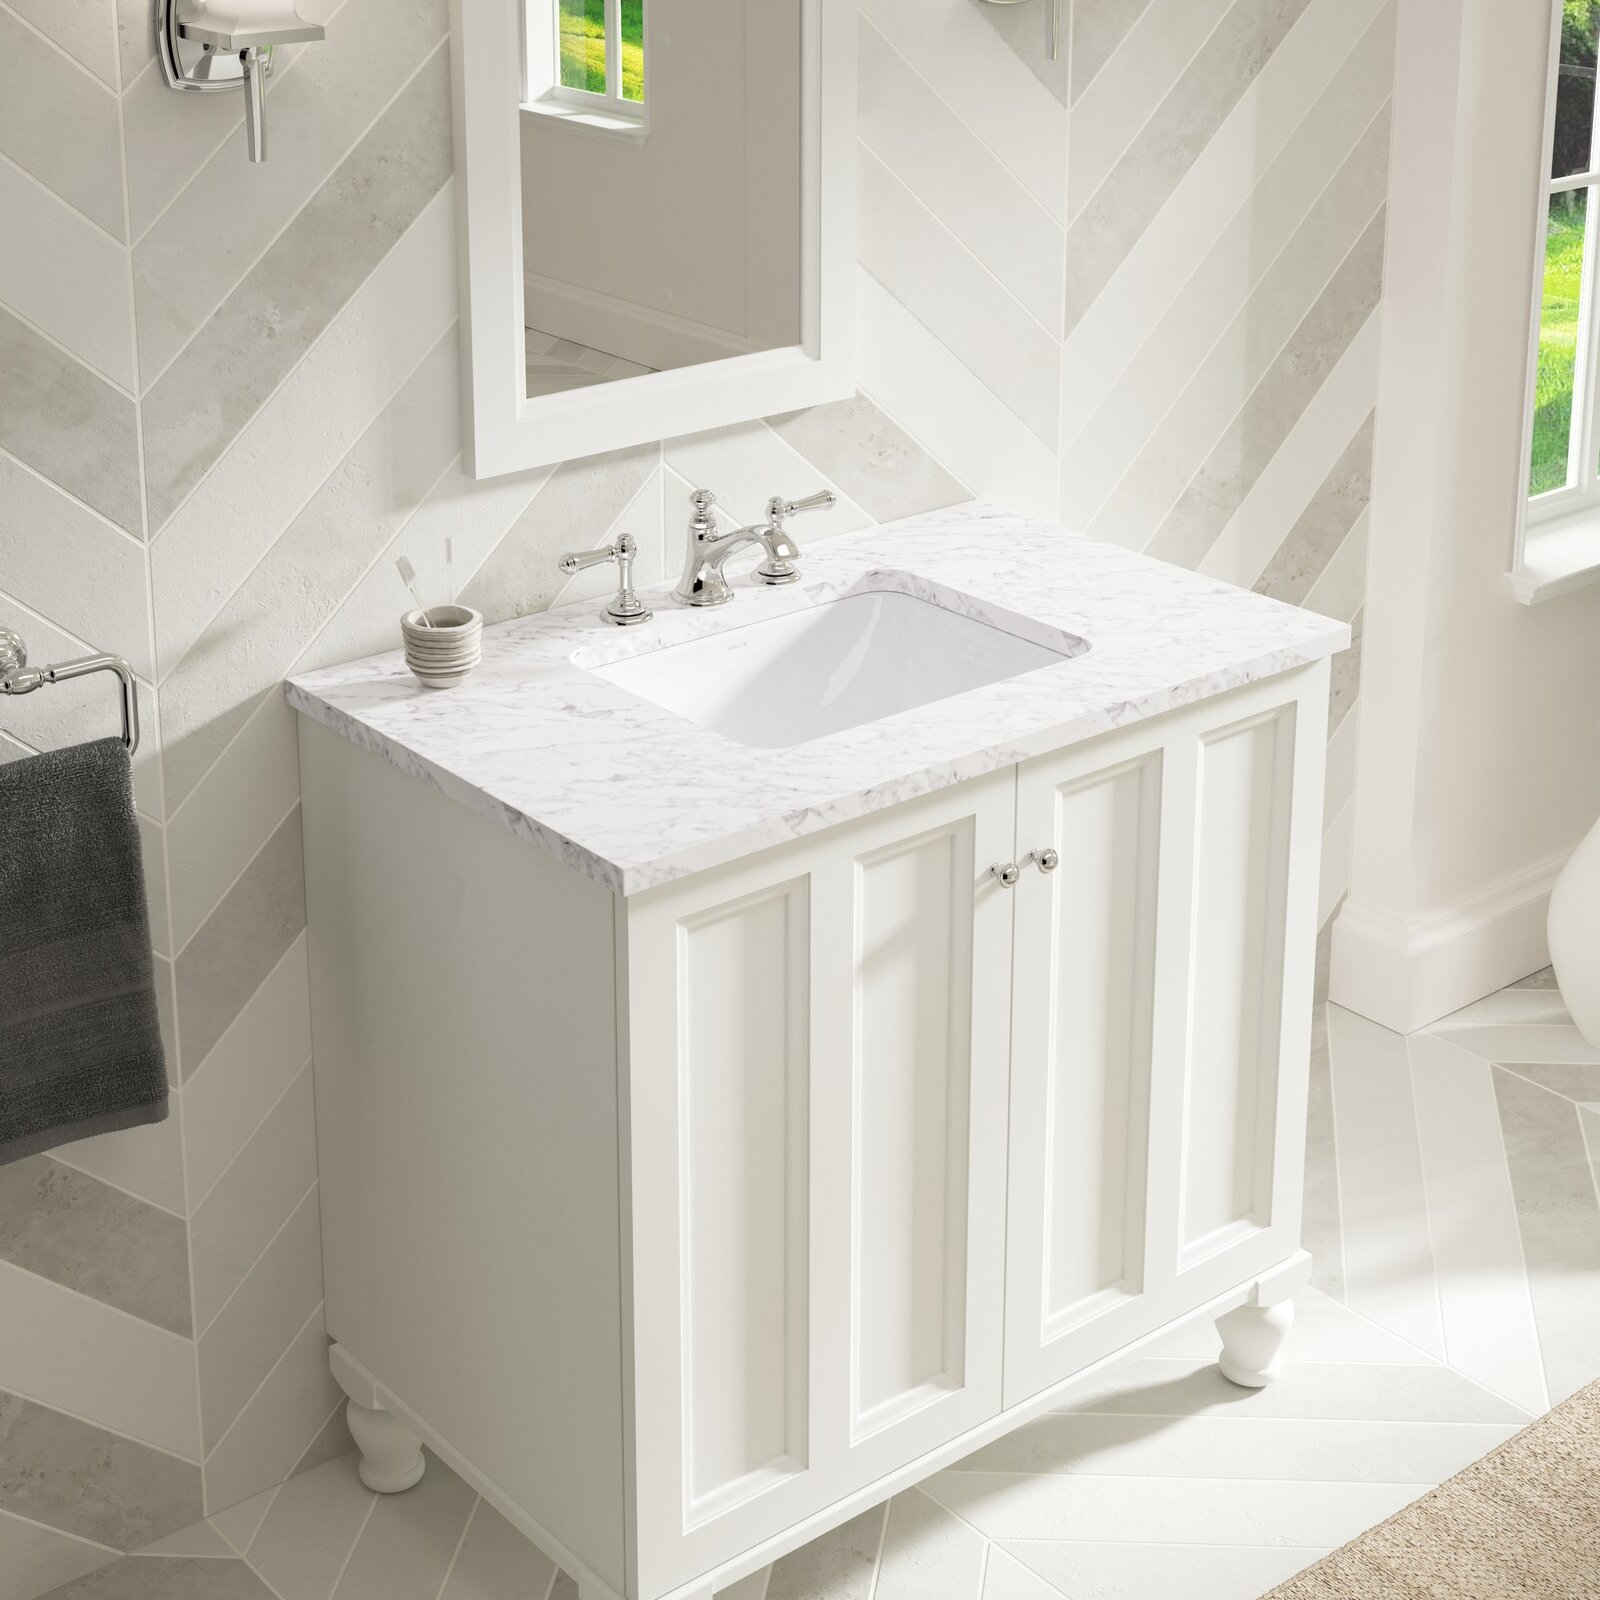 Kohler caxton rectangle undermount bathroom sink with - Kohler rectangular bathroom sinks ...